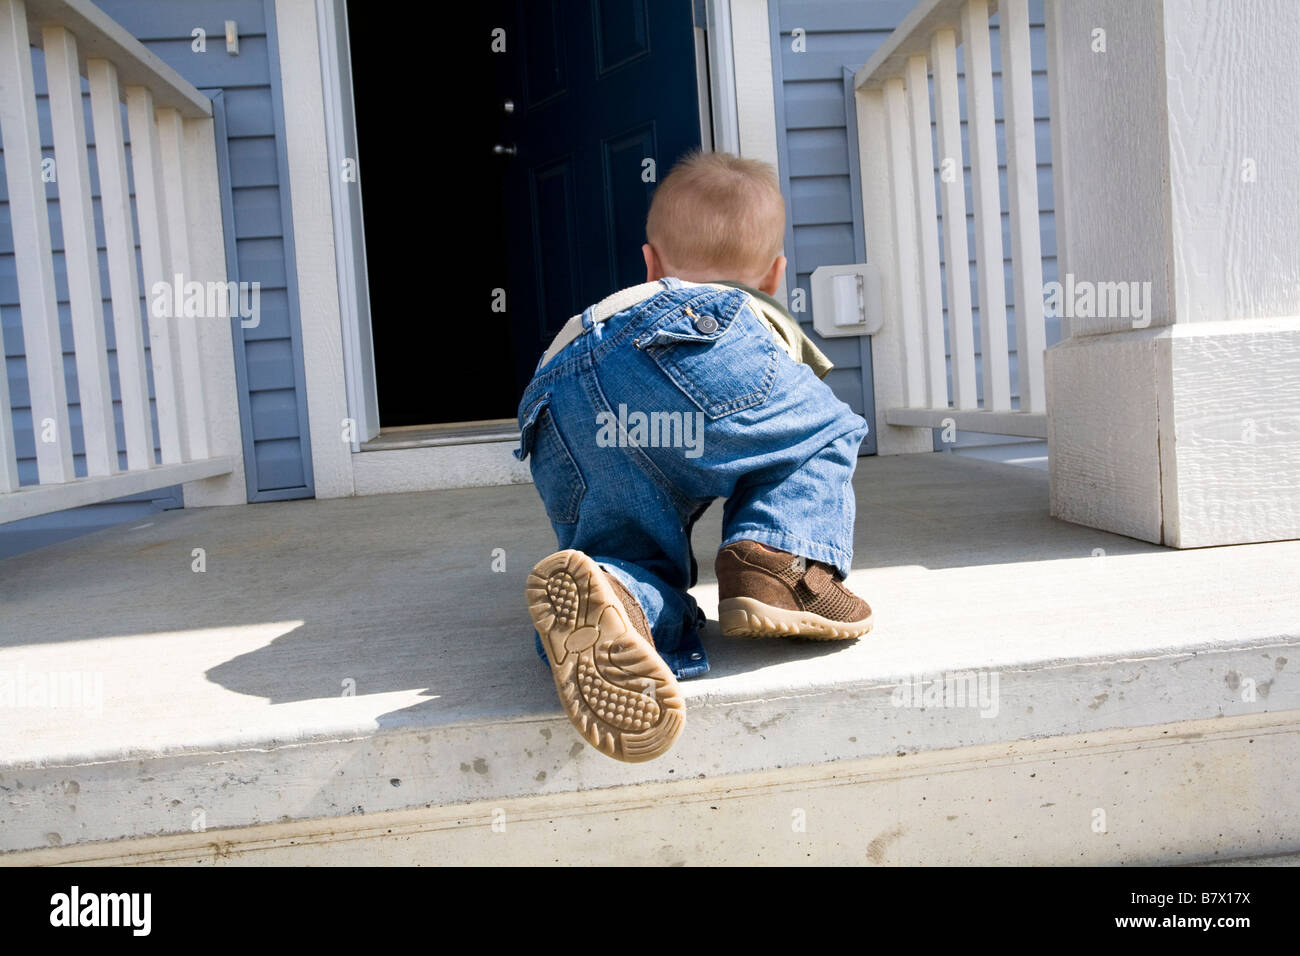 Kind krabbeln in Richtung offene Tür Stockfoto